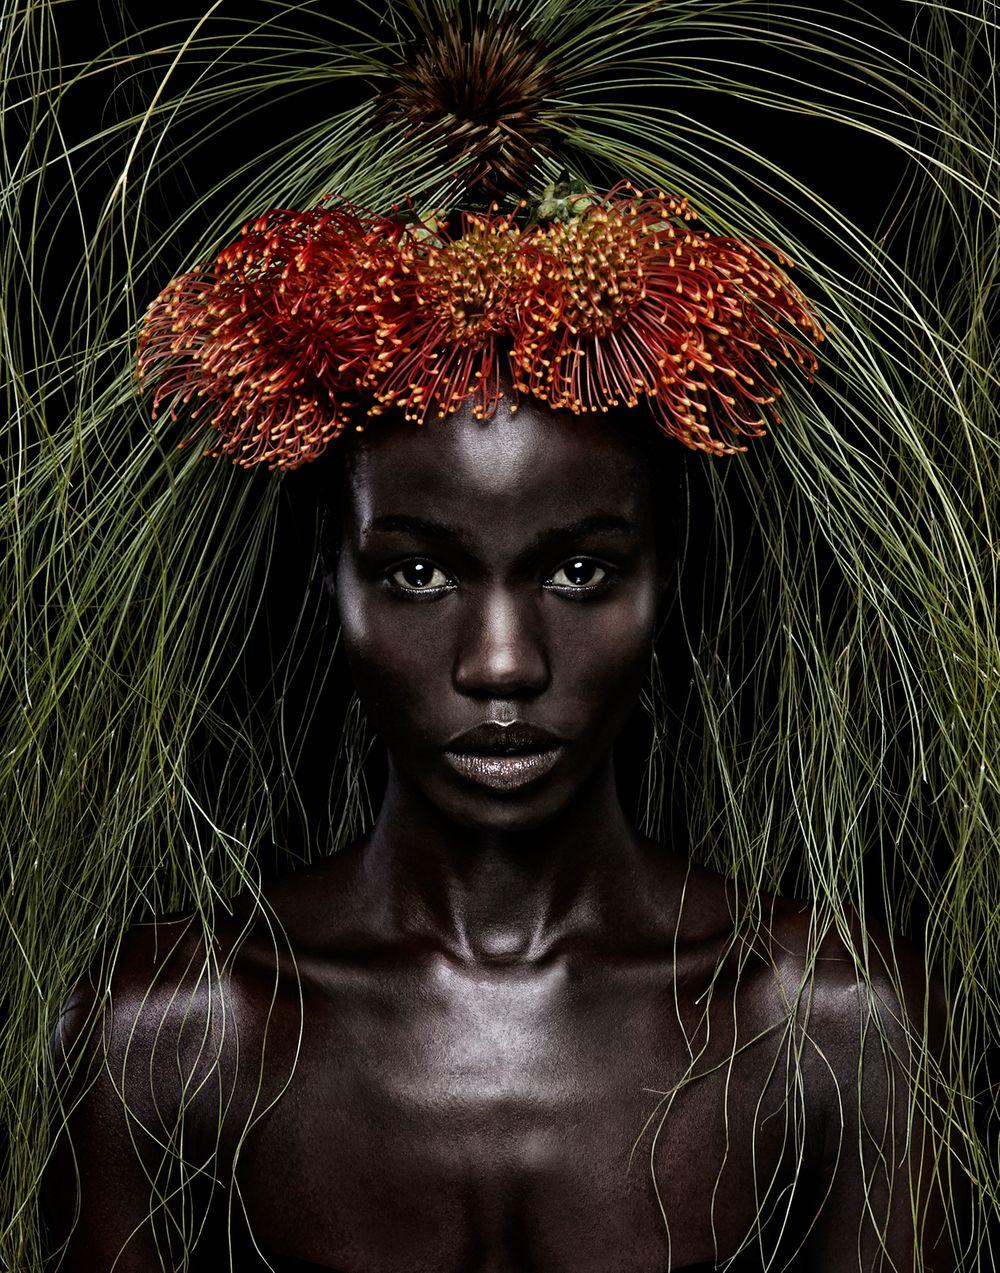 Wild_Beauty_1-V2.jpg